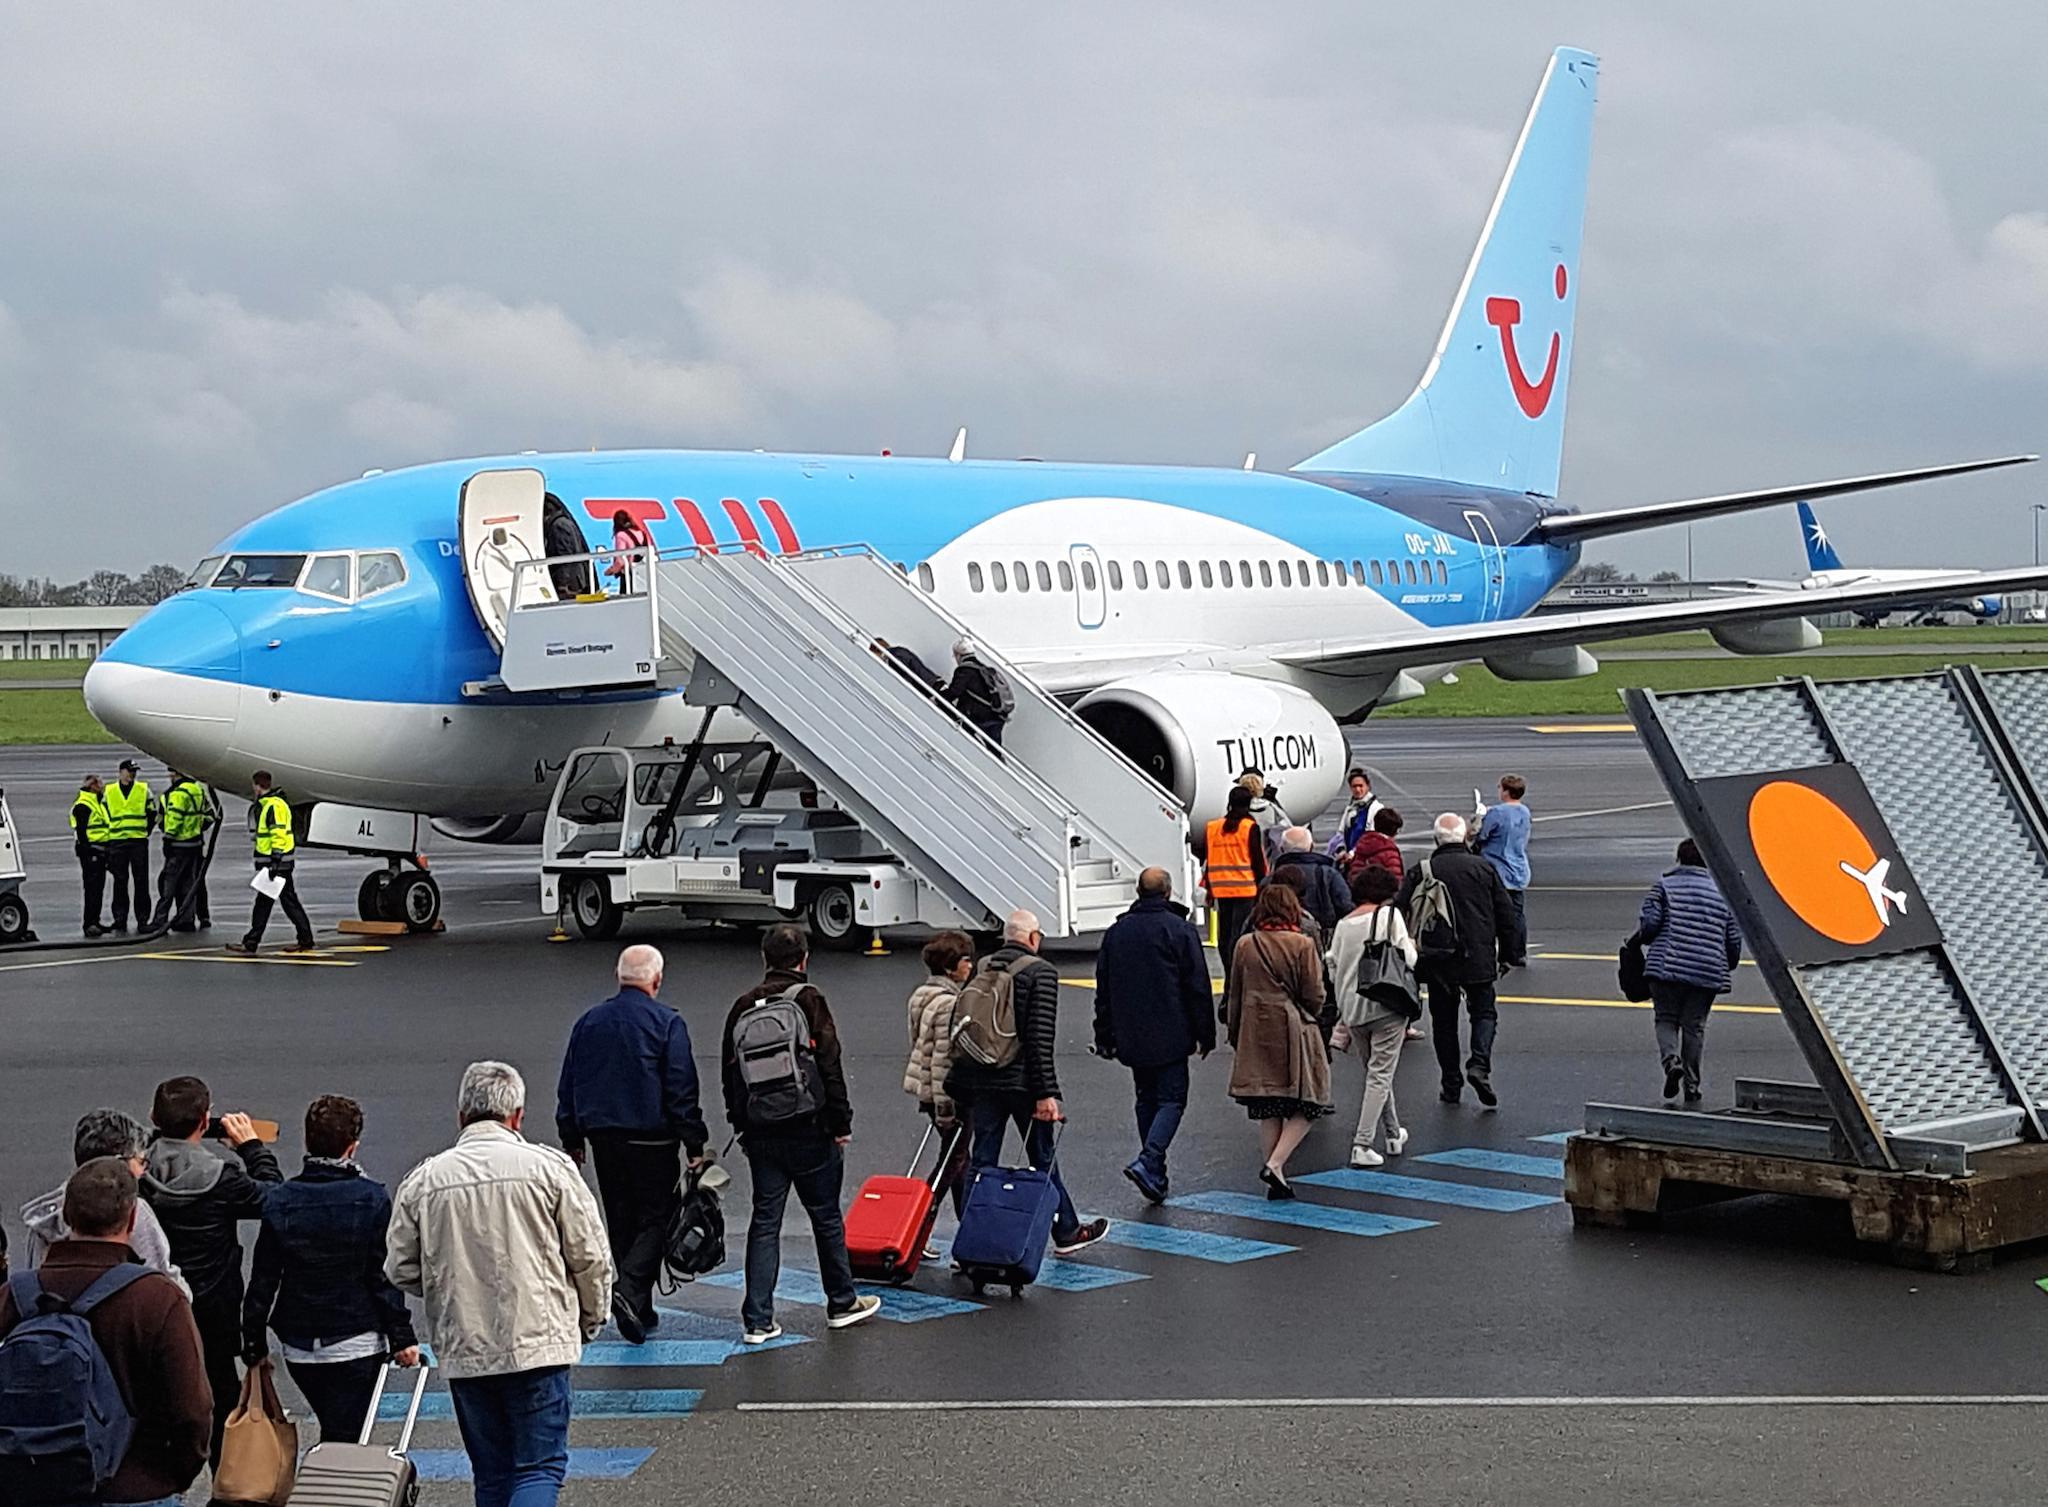 1er vol entre Rennes et Palerme le 9 AVril 2018